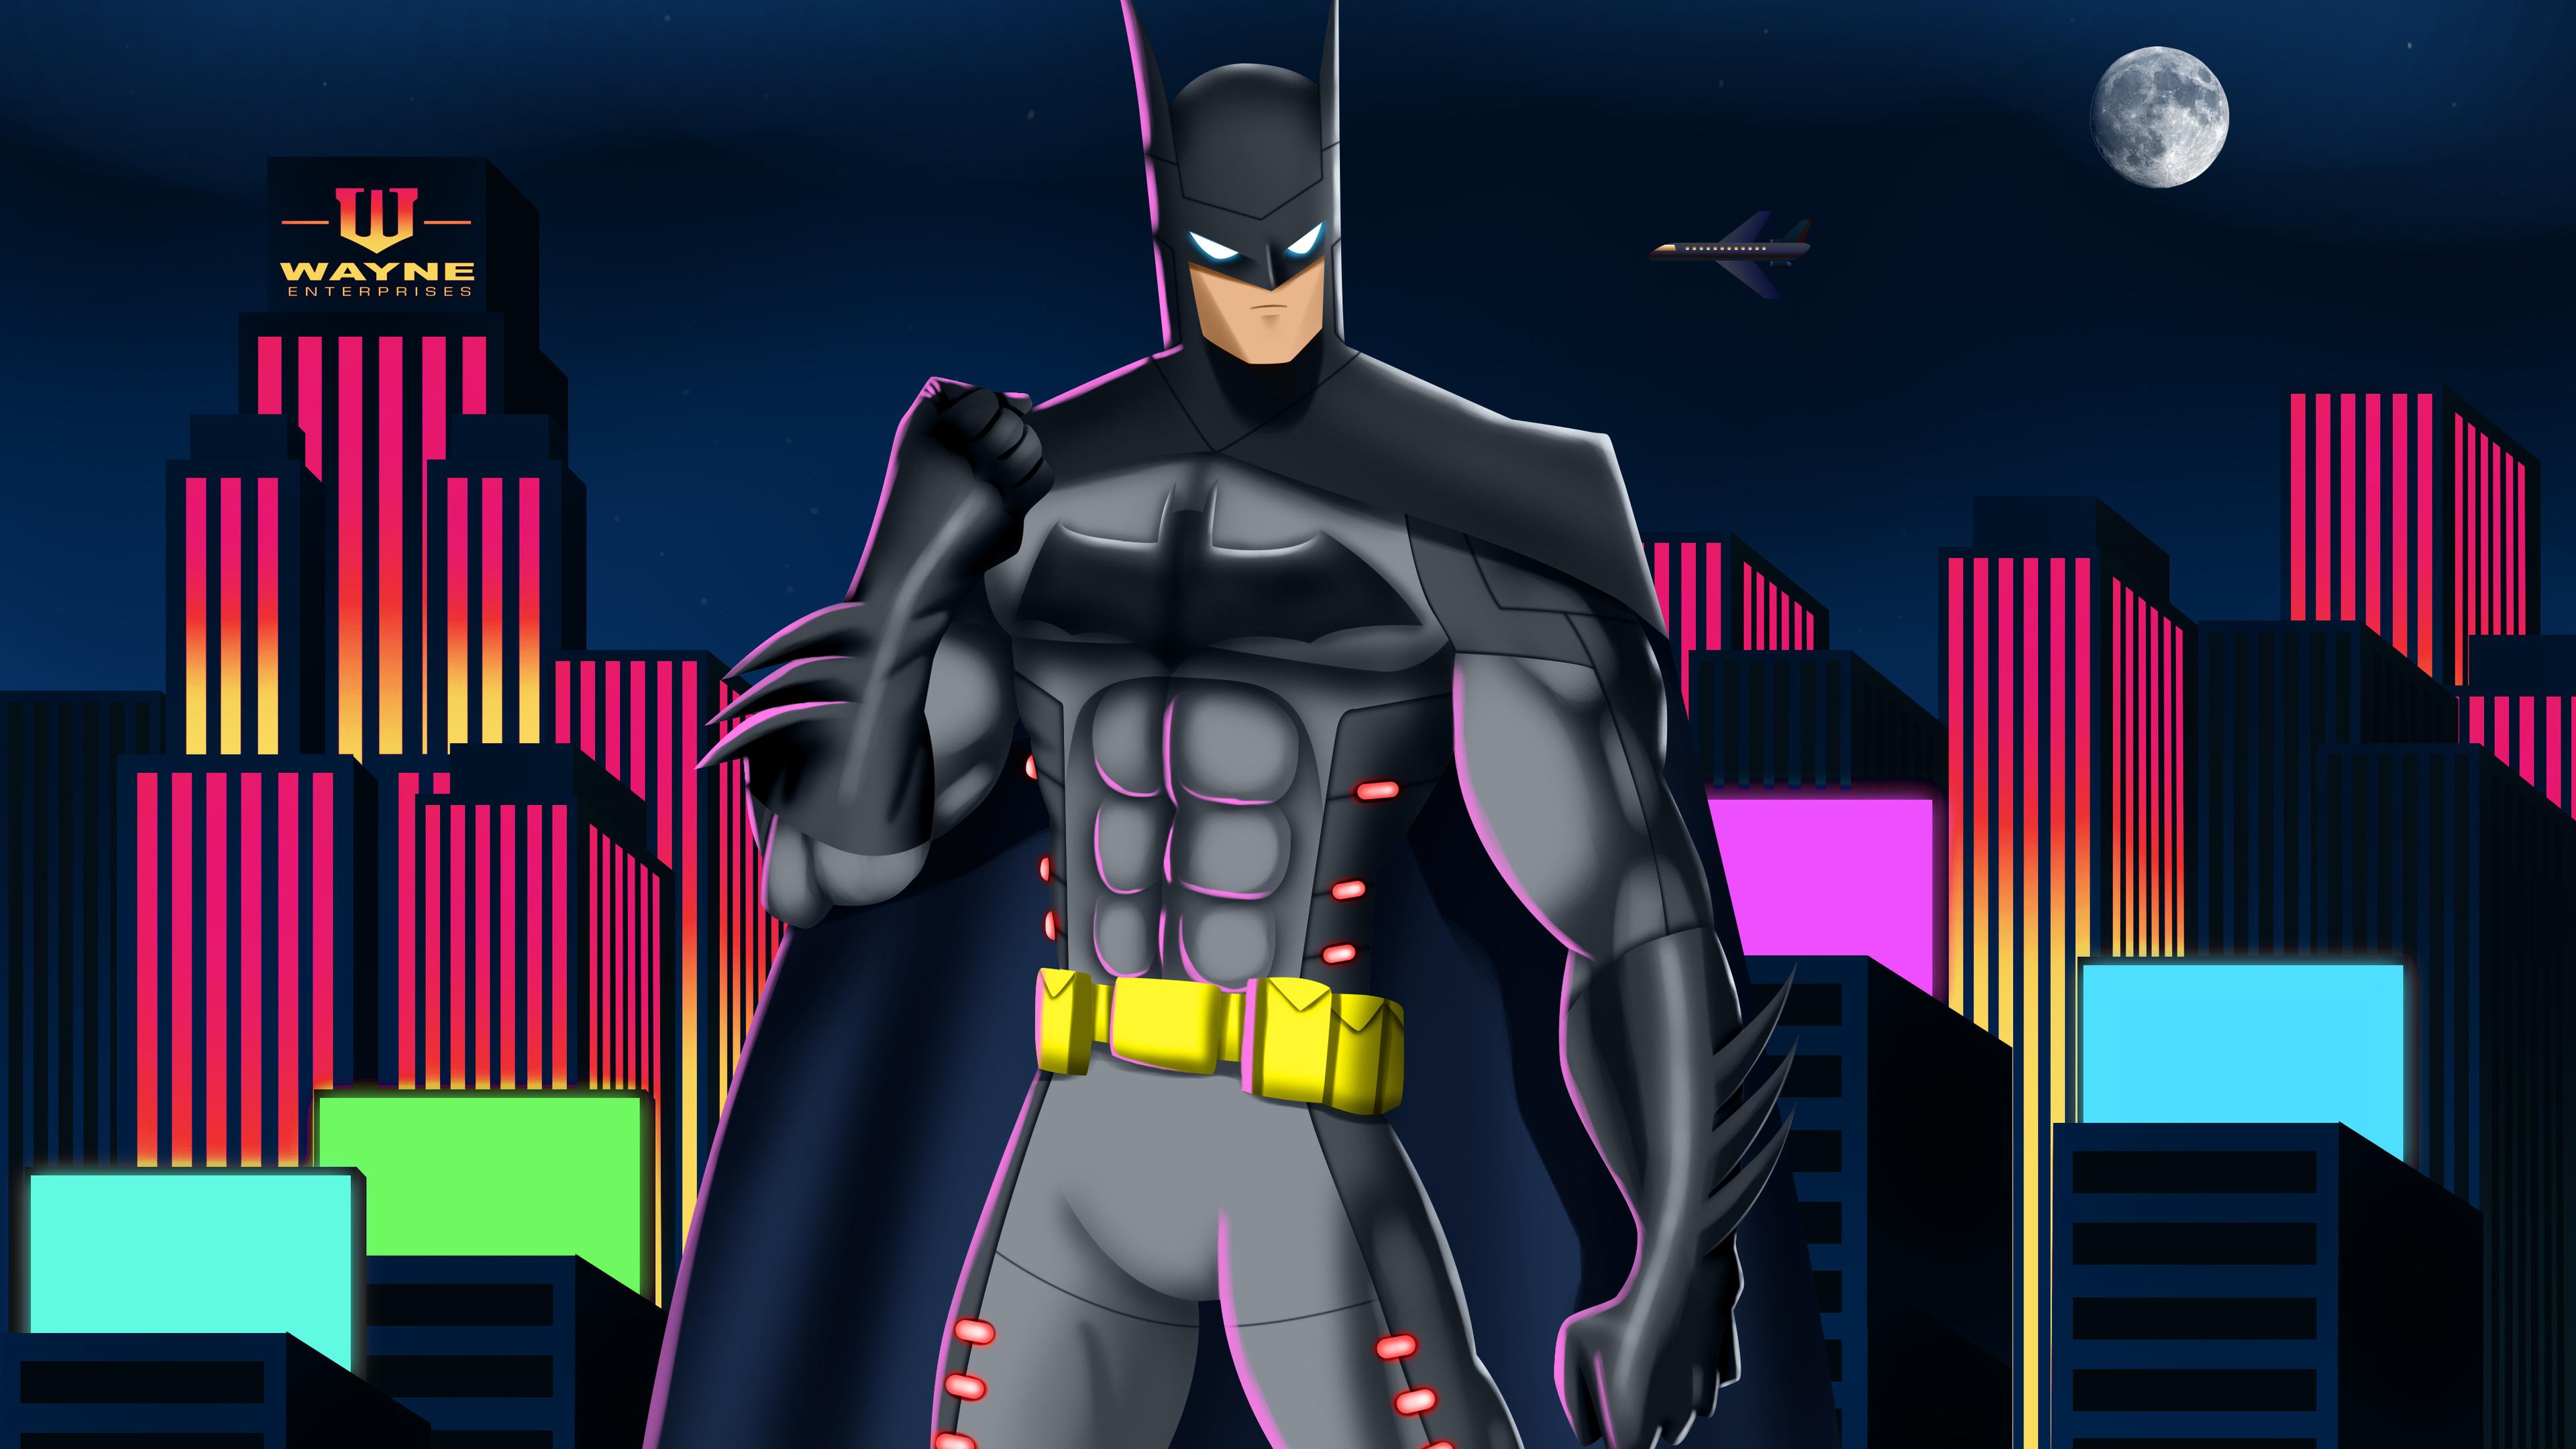 gotham protector 1541294454 - Gotham Protector - superheroes wallpapers, hd-wallpapers, digital art wallpapers, deviantart wallpapers, batman wallpapers, artwork wallpapers, artist wallpapers, 4k-wallpapers